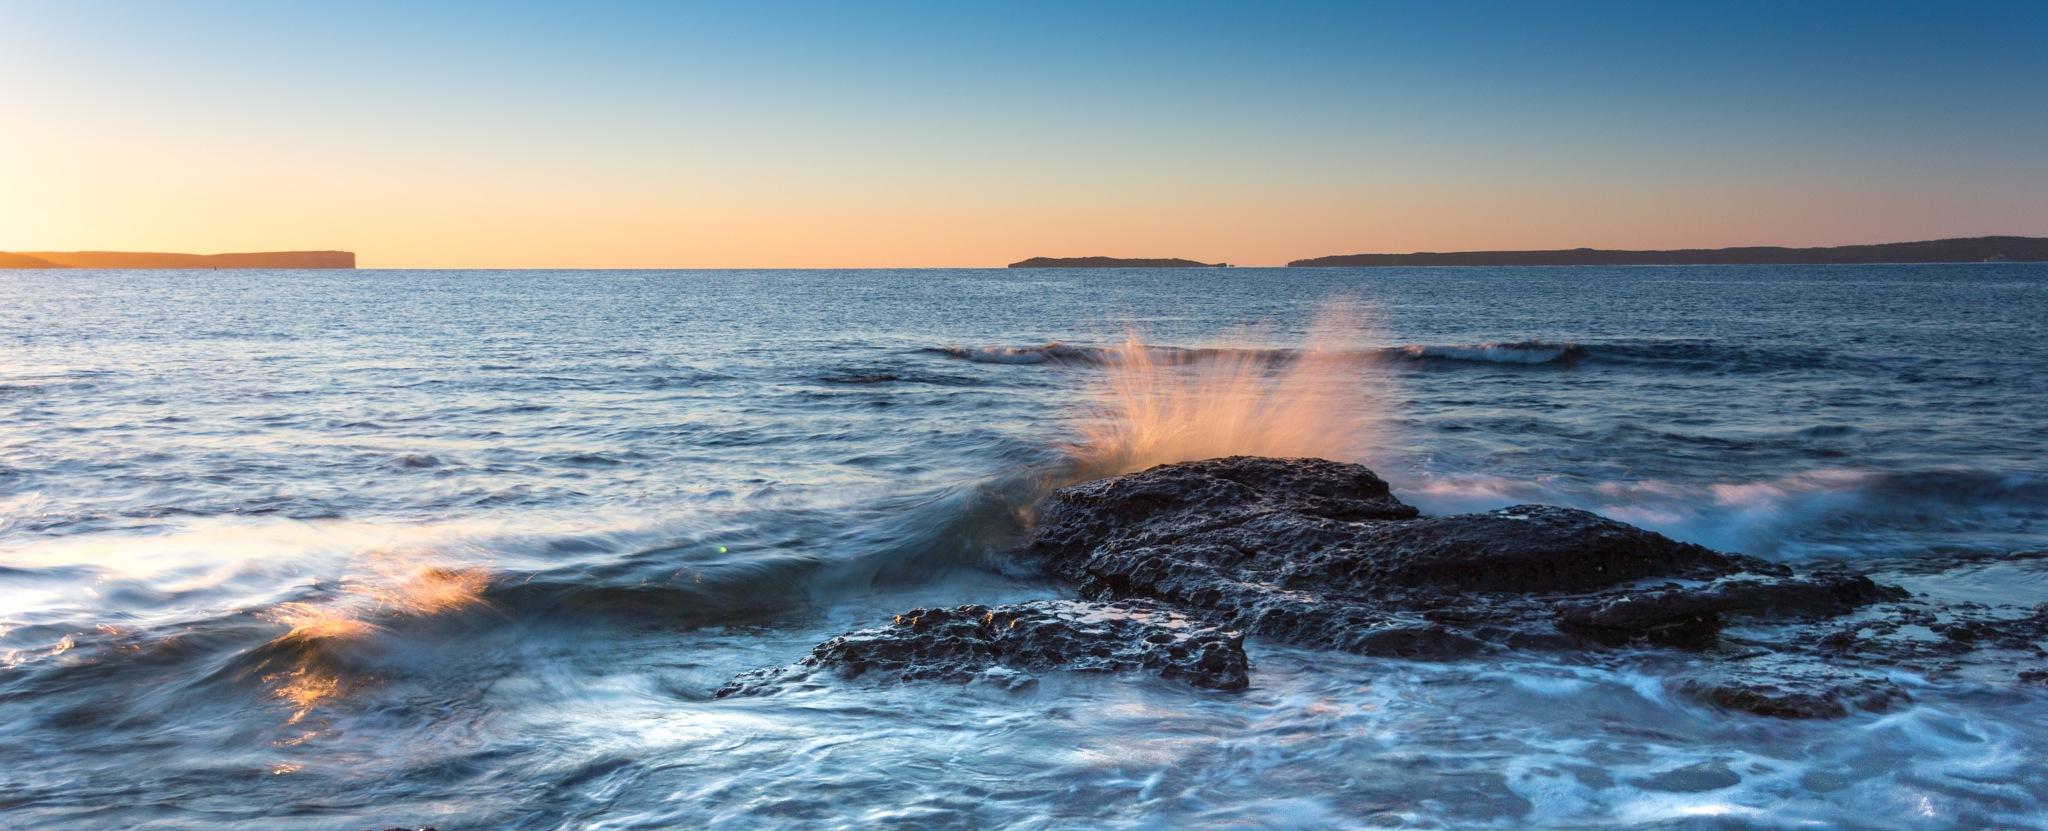 Photo in Landscape #waves #ocean #sea #sunrise #jervisbay #water #rocks #landscape #cover